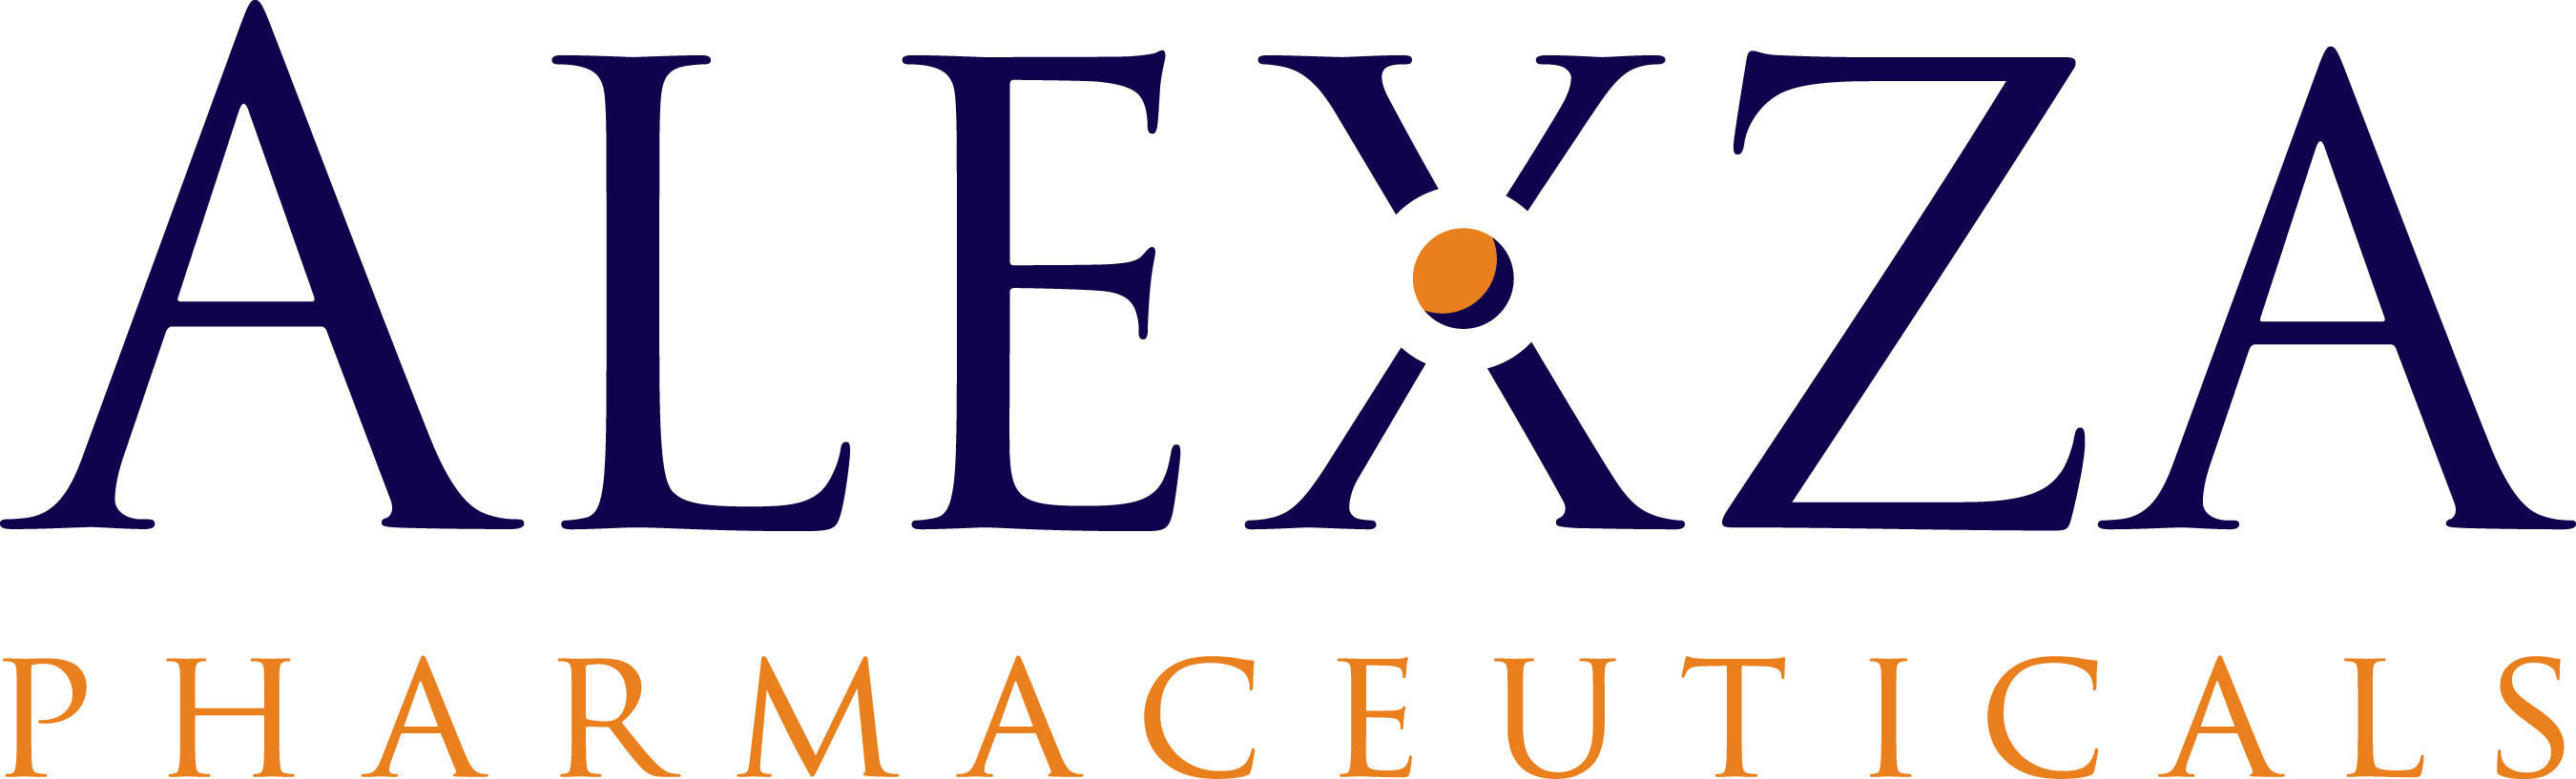 Alexza Pharmaceuticals.